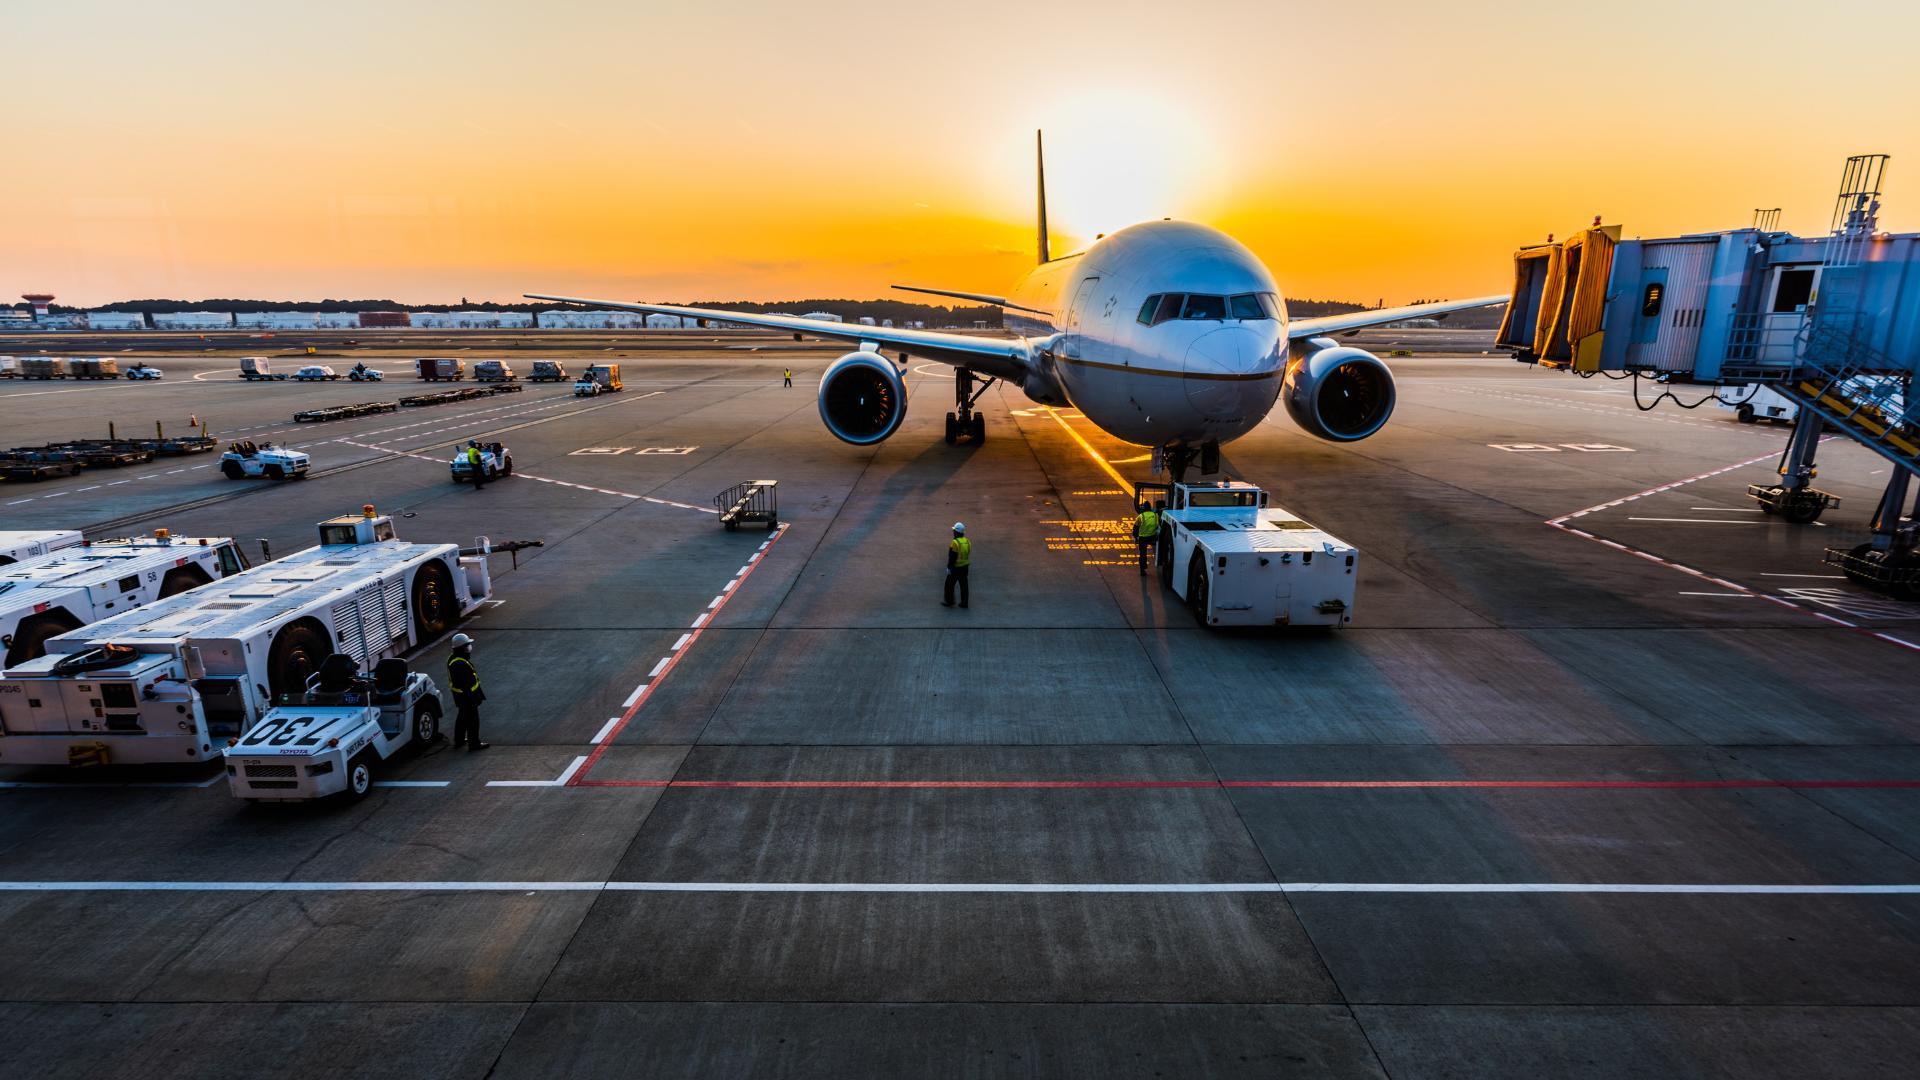 Schiphol Airport rilascia servizi al cliente più rapidamente grazie all'agile cloud di OpenShift